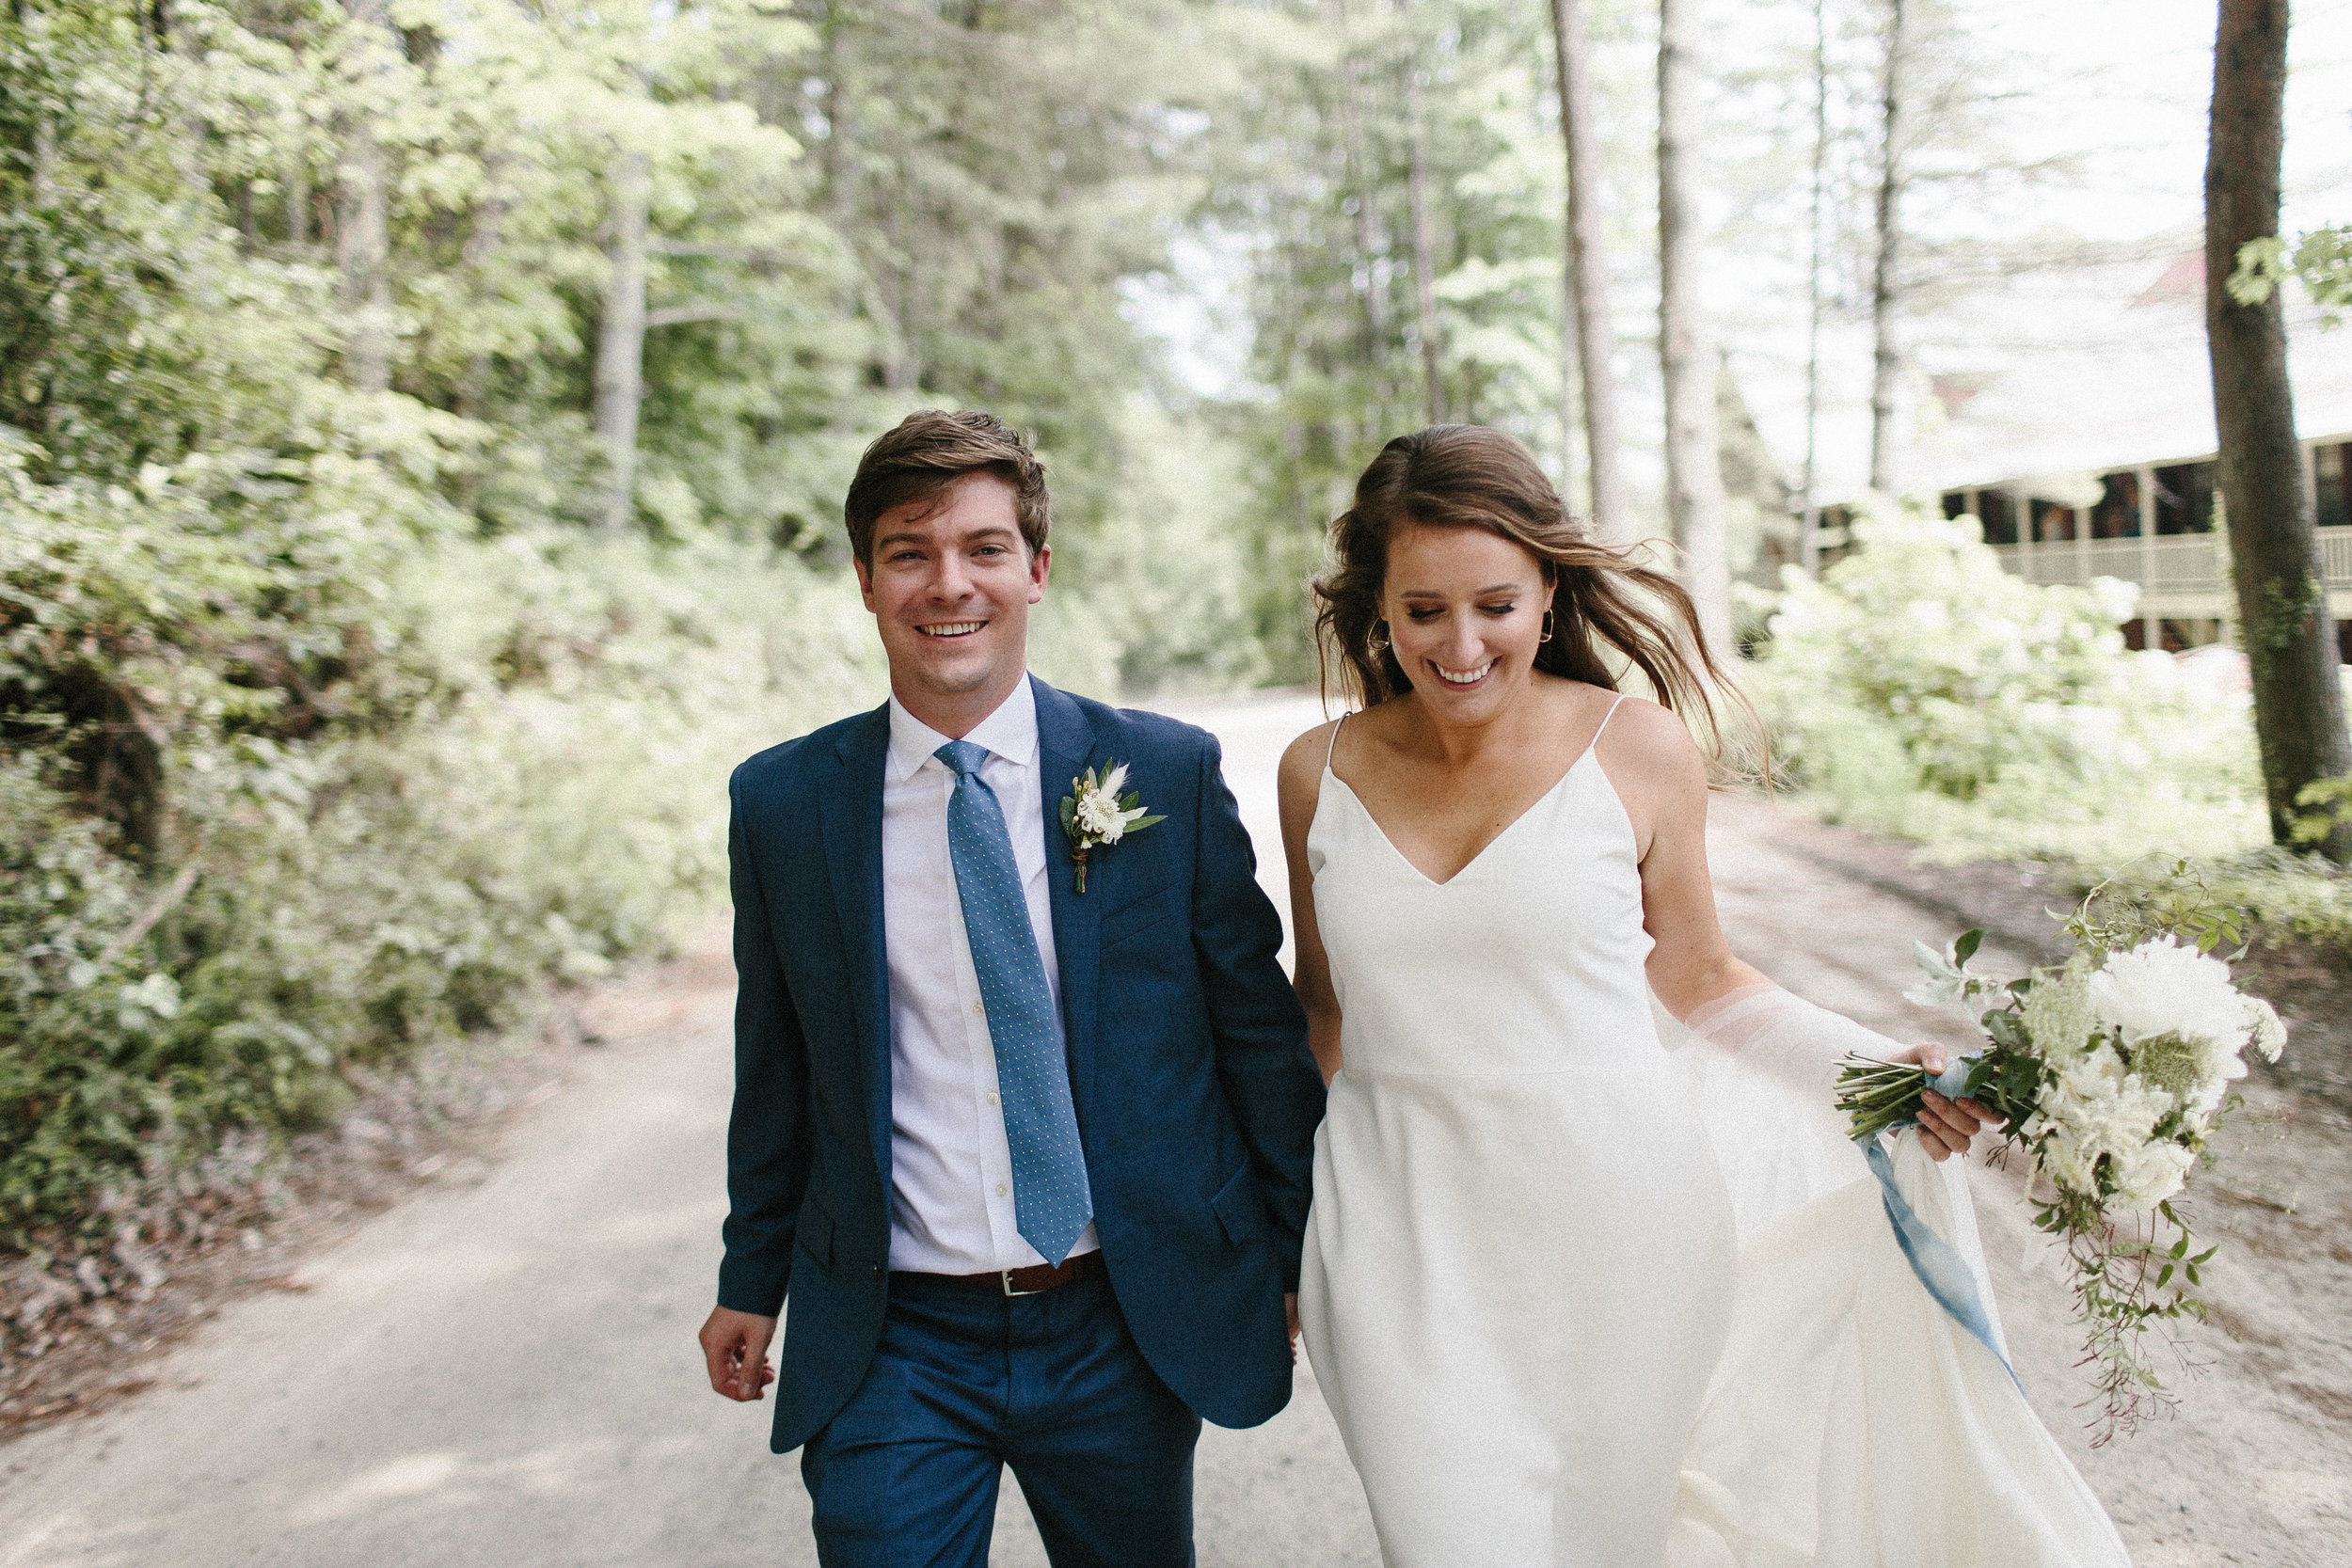 glen_ella_meadow_creekside_atlanta_wedding_photographers_1417.jpg